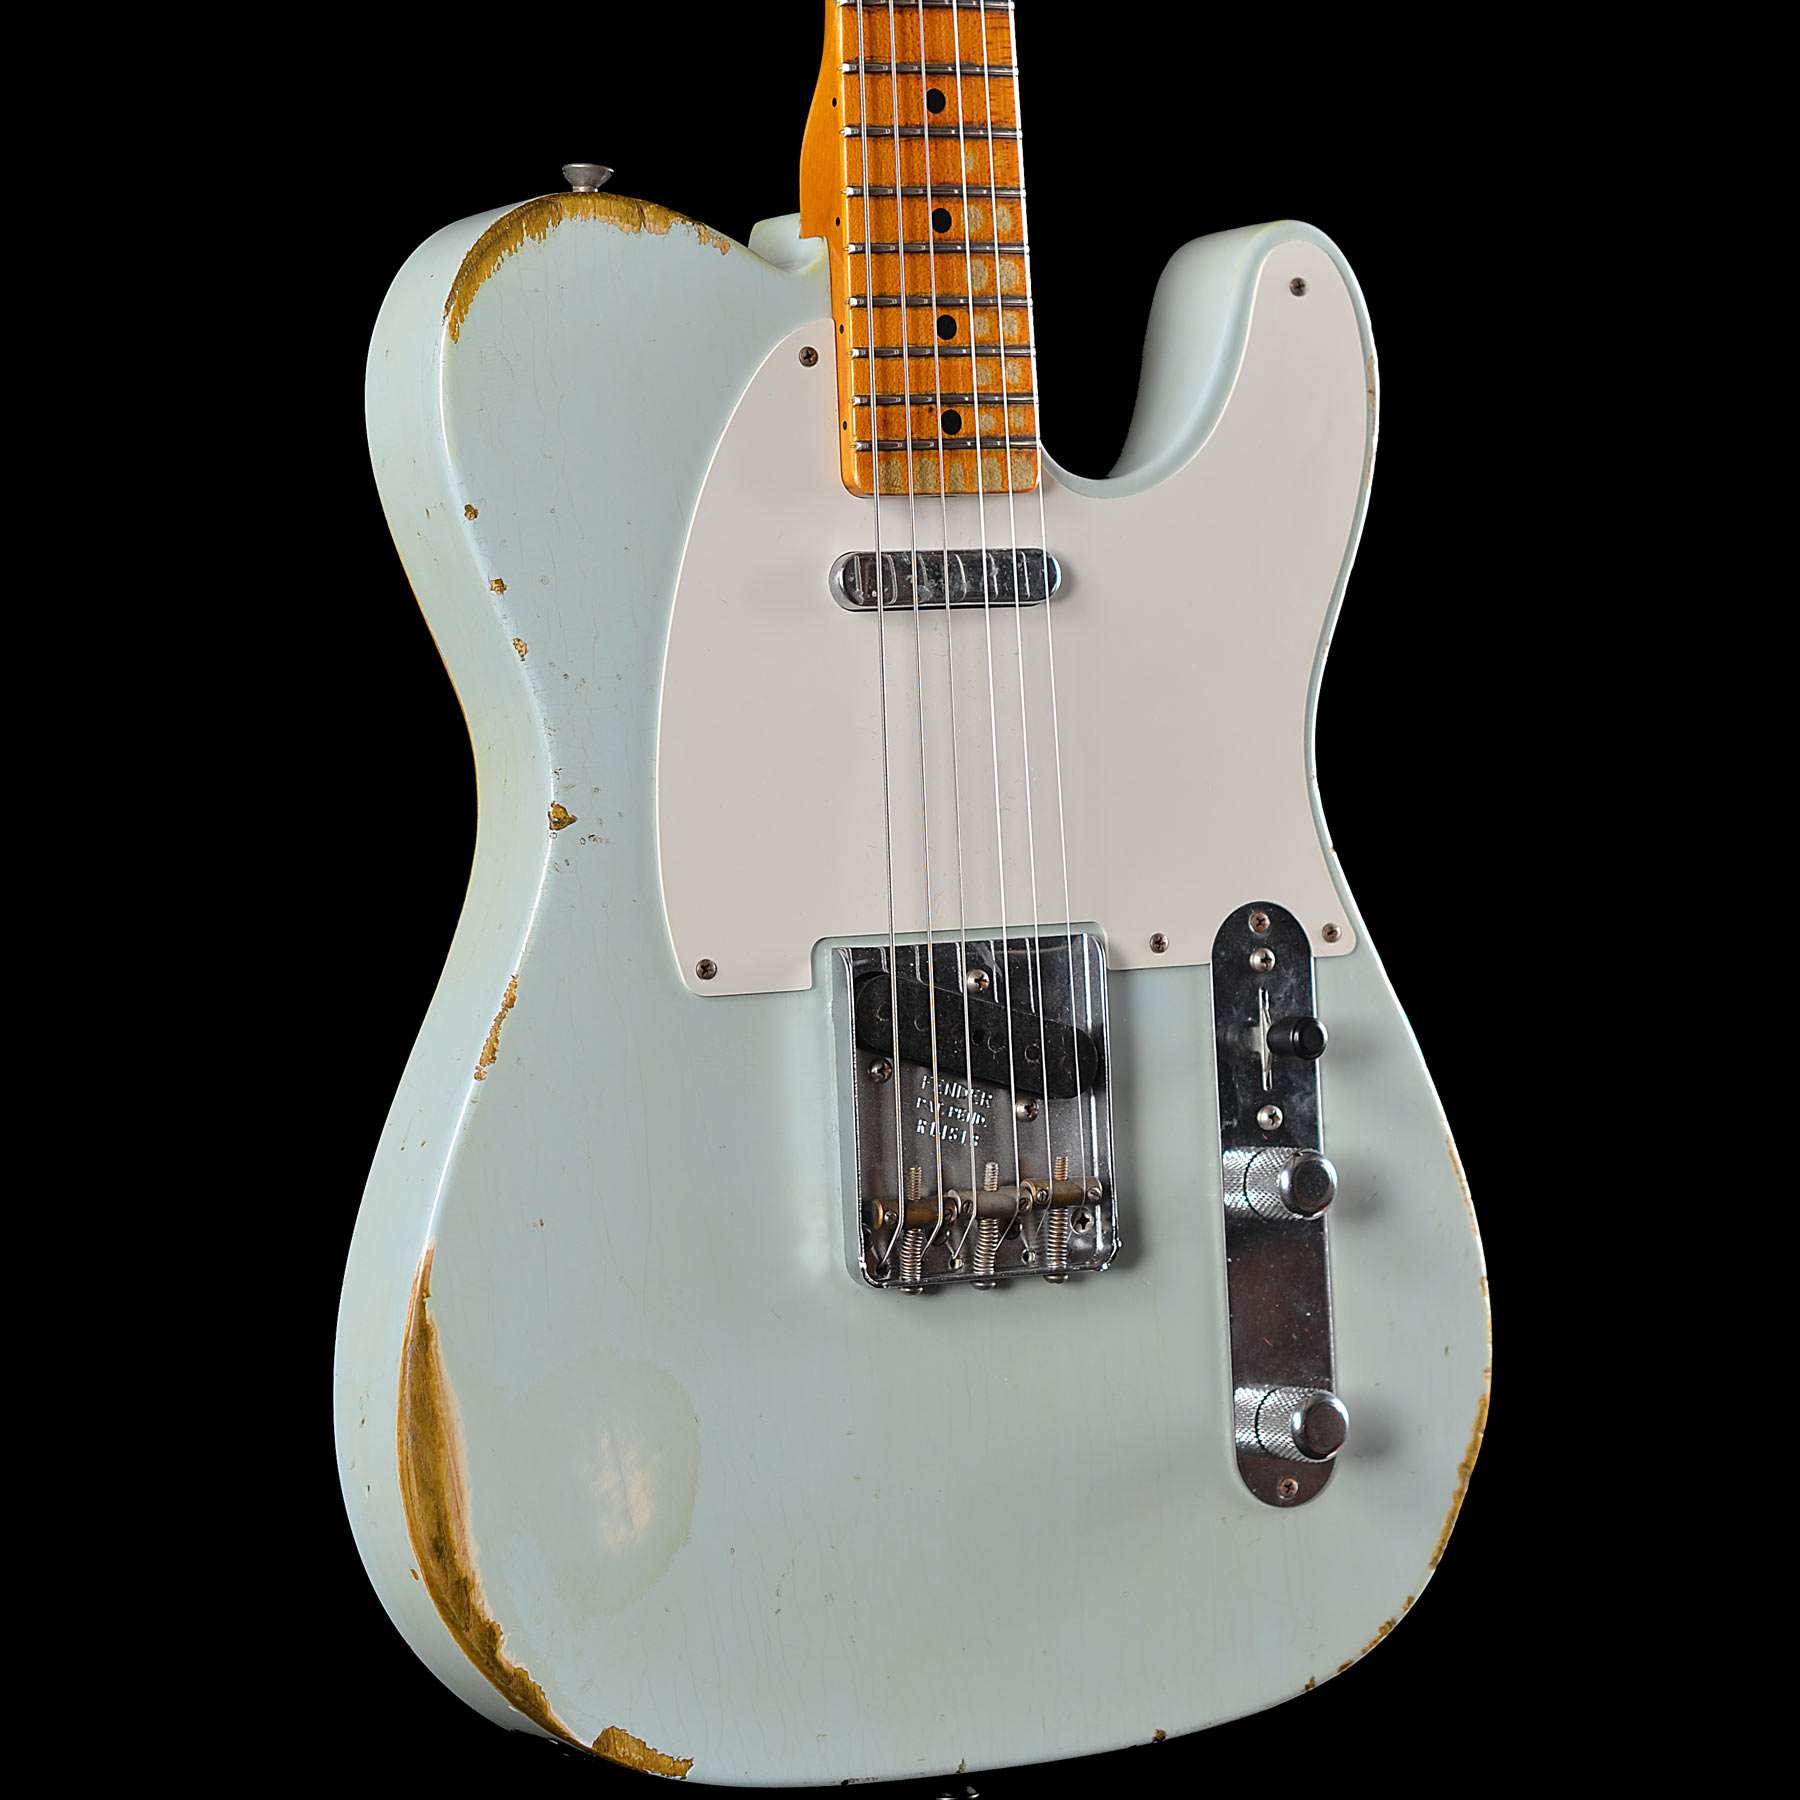 fender 1952 telecaster heavy relic faded sonic blue streamlined u neck wild west guitars. Black Bedroom Furniture Sets. Home Design Ideas